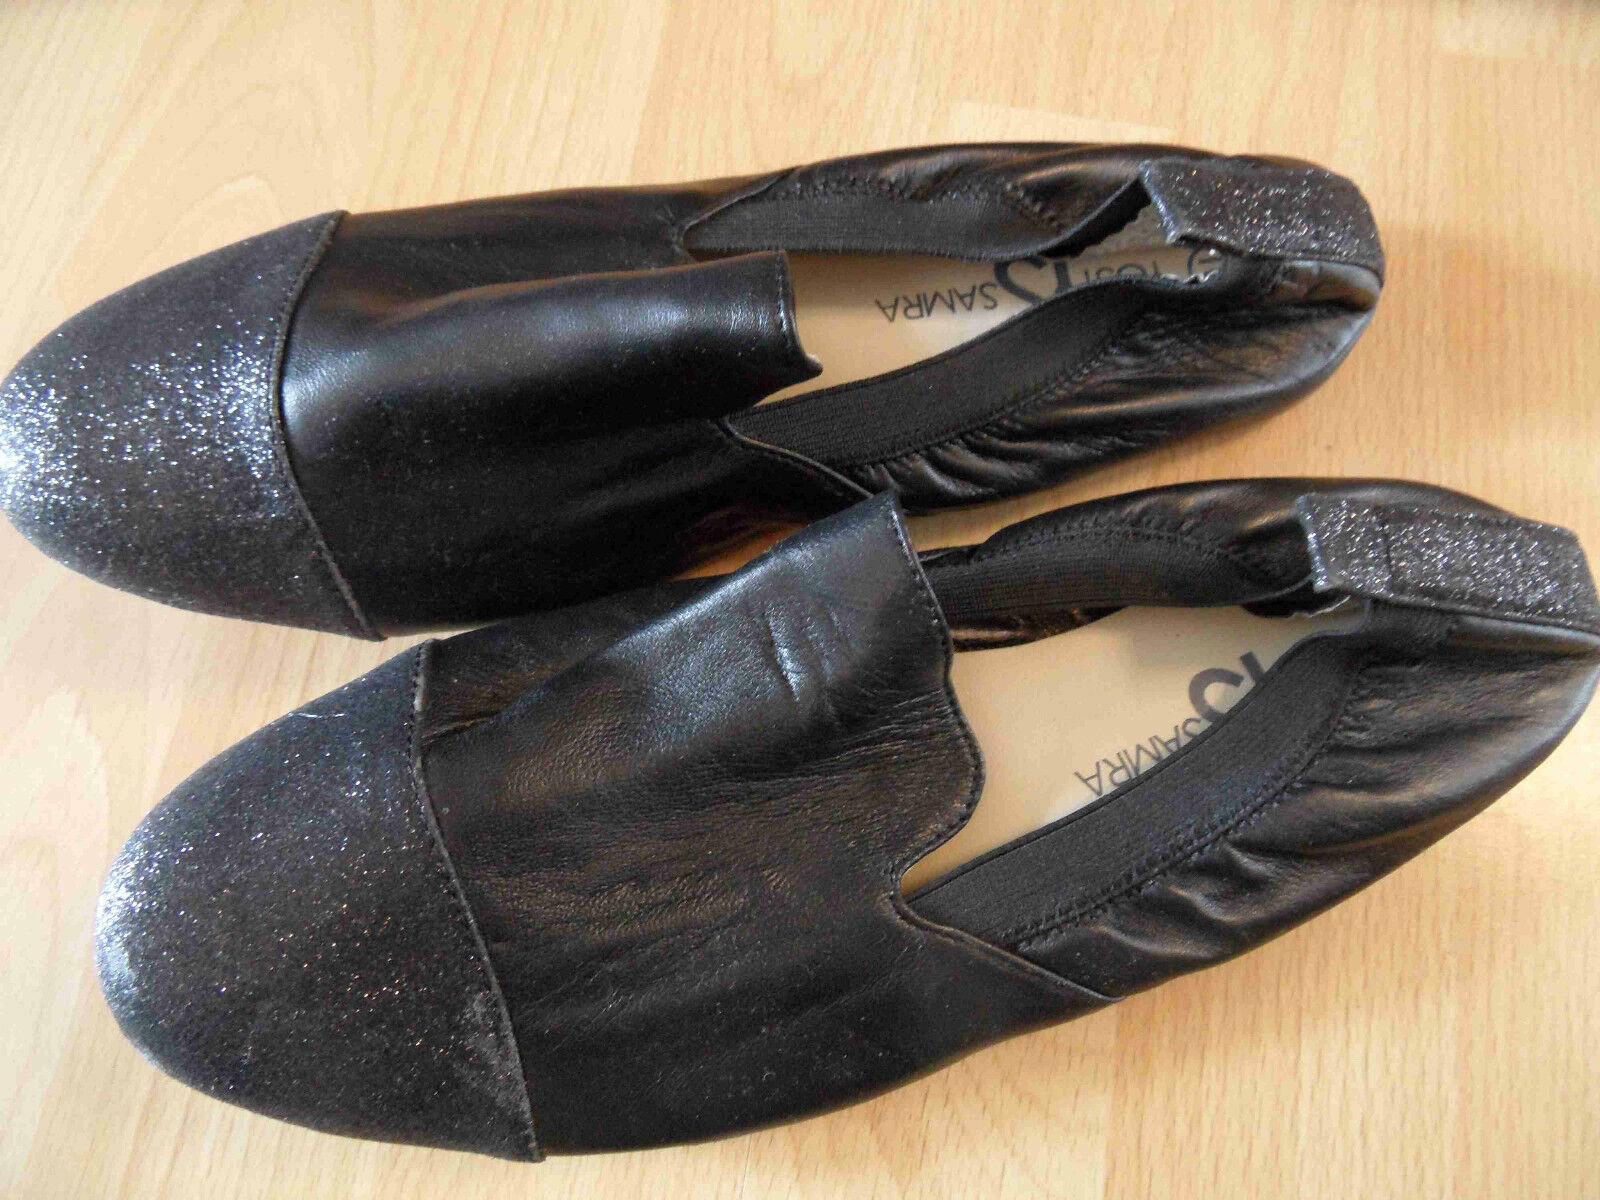 YOSI SAMRA stylische edle Loafer black m. Glitzer Gr. 40  NEU BSu316